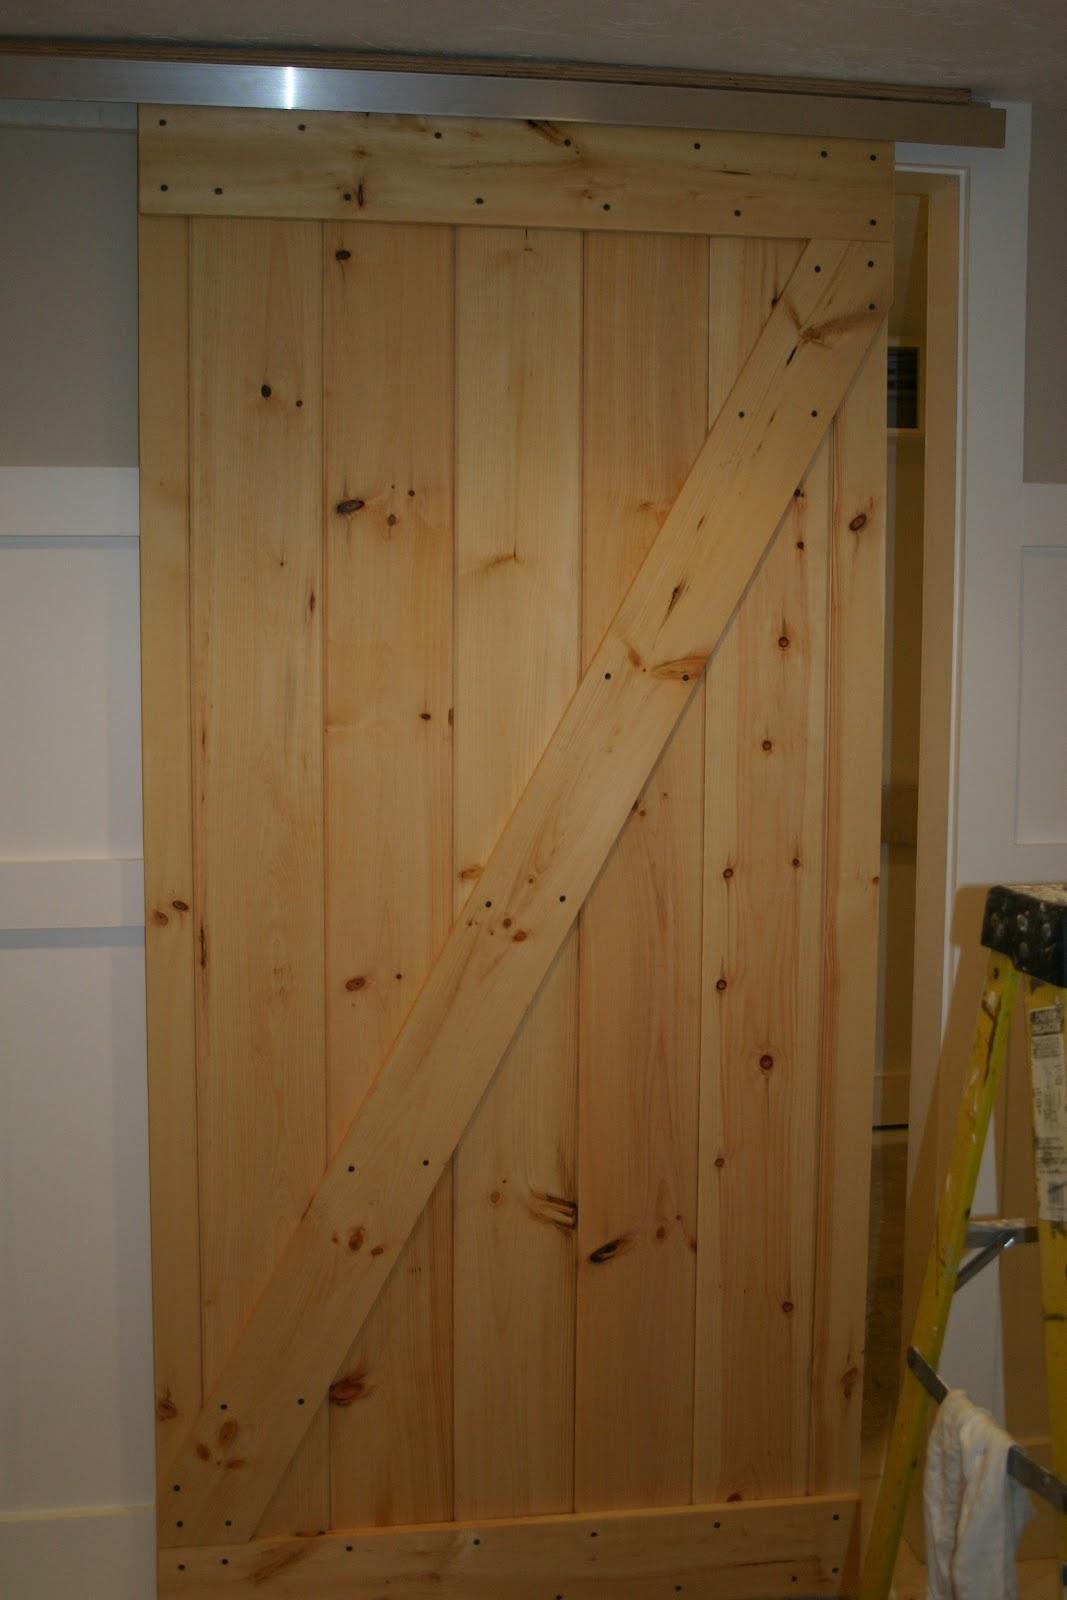 Home decor innovations sliding mirror doors home decor innovations oak mirror sliding wardrobe - Home decor innovations sliding mirror doors ...